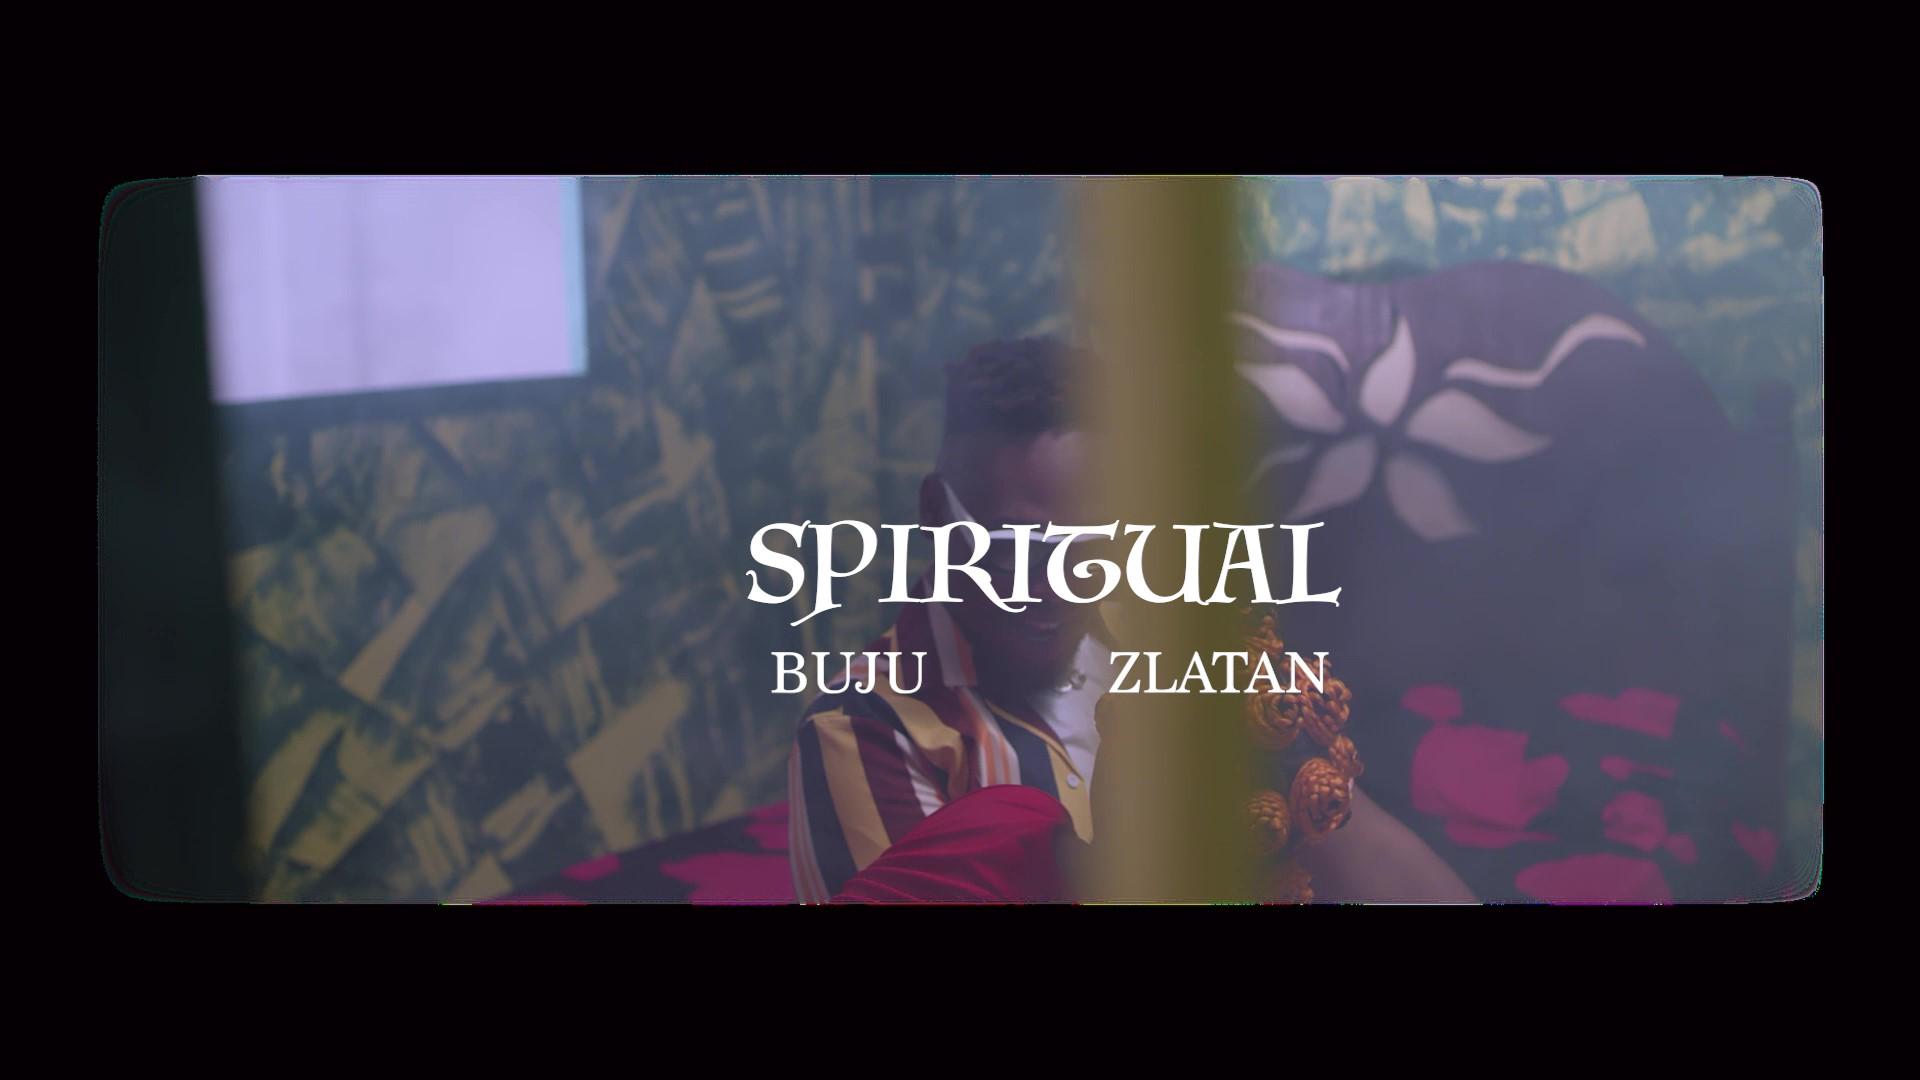 VIDEO: Buju ft. Zlatan - Spiritual